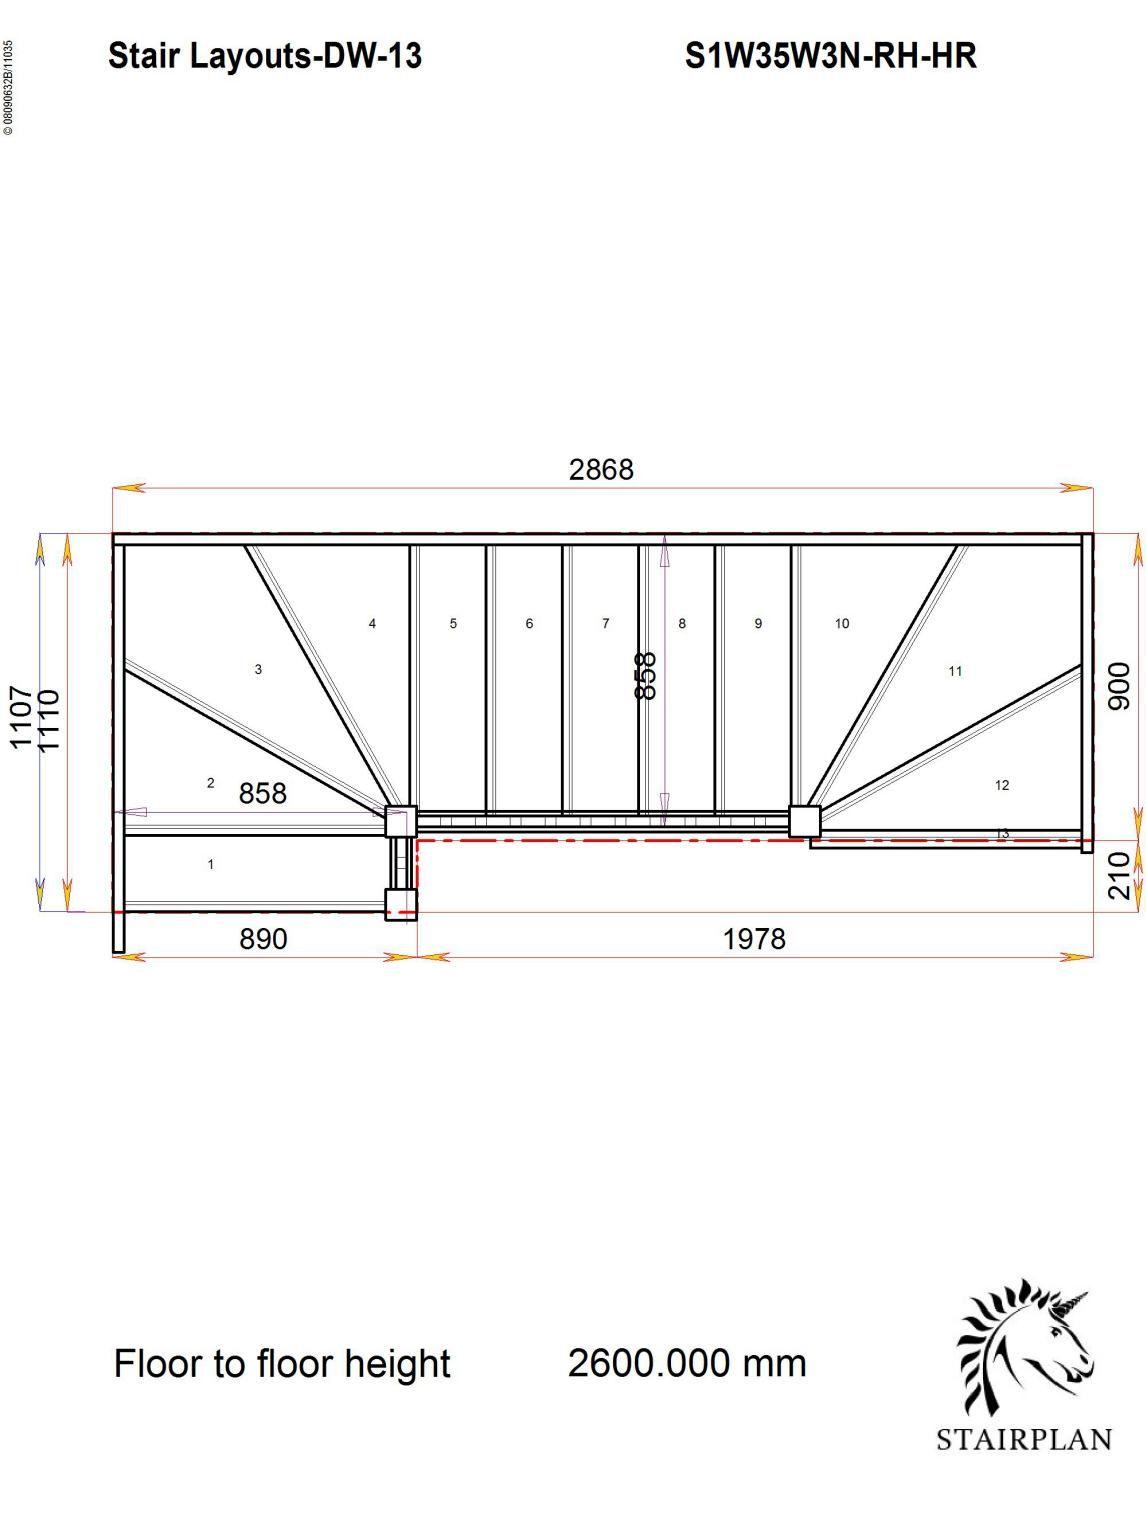 tradestairs rh double winder handrail [ 1146 x 1515 Pixel ]